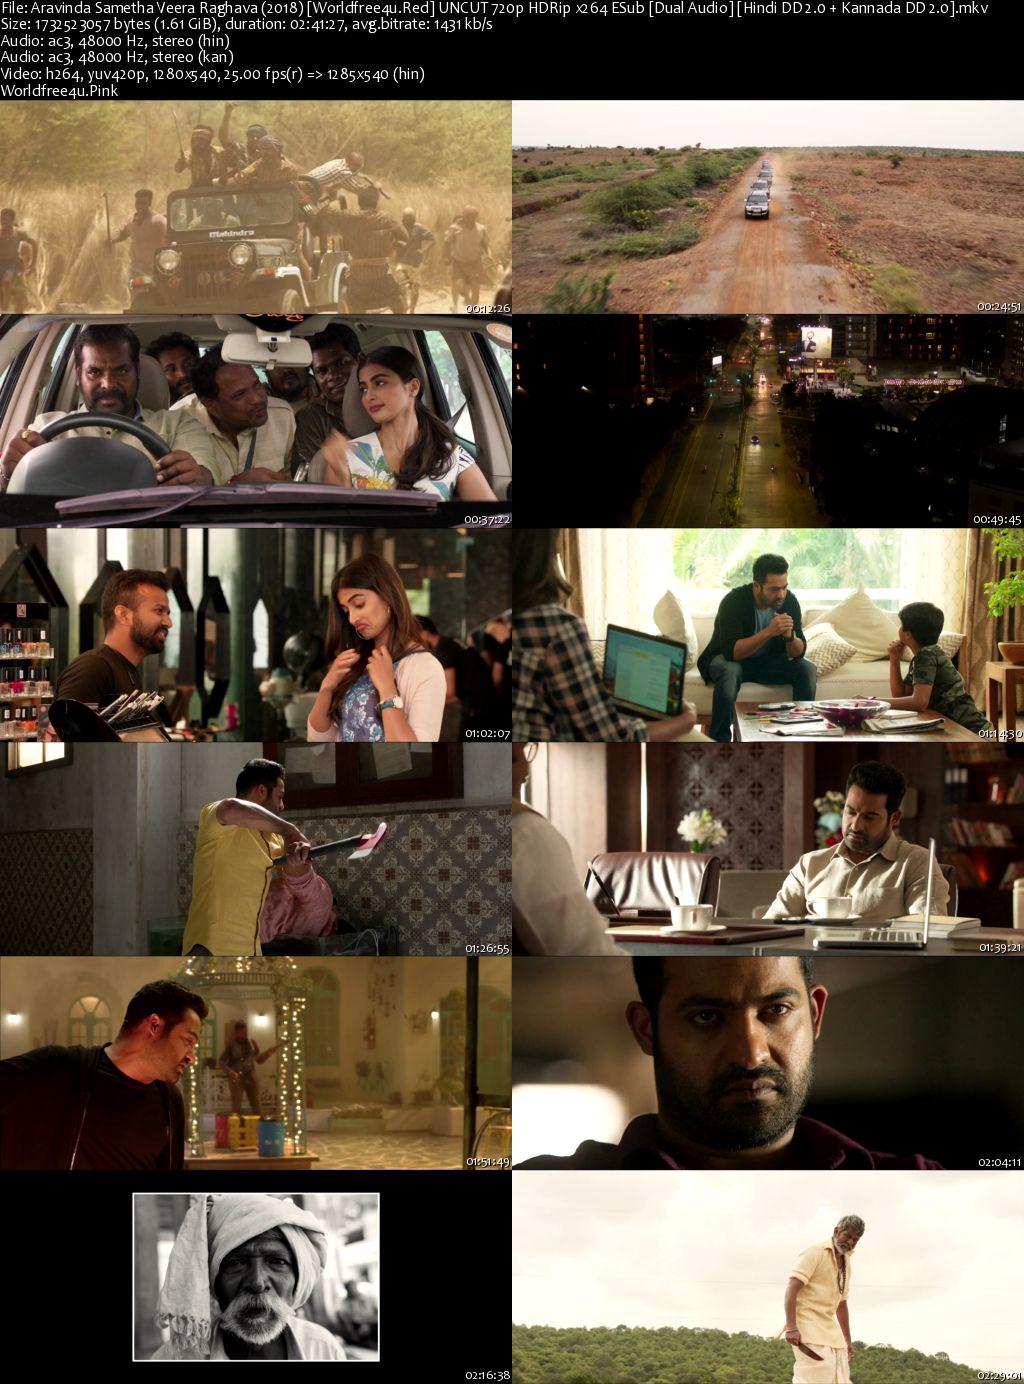 Aravinda Sametha Veera Raghava 2018 Hindi Dubbed HDRip 720p